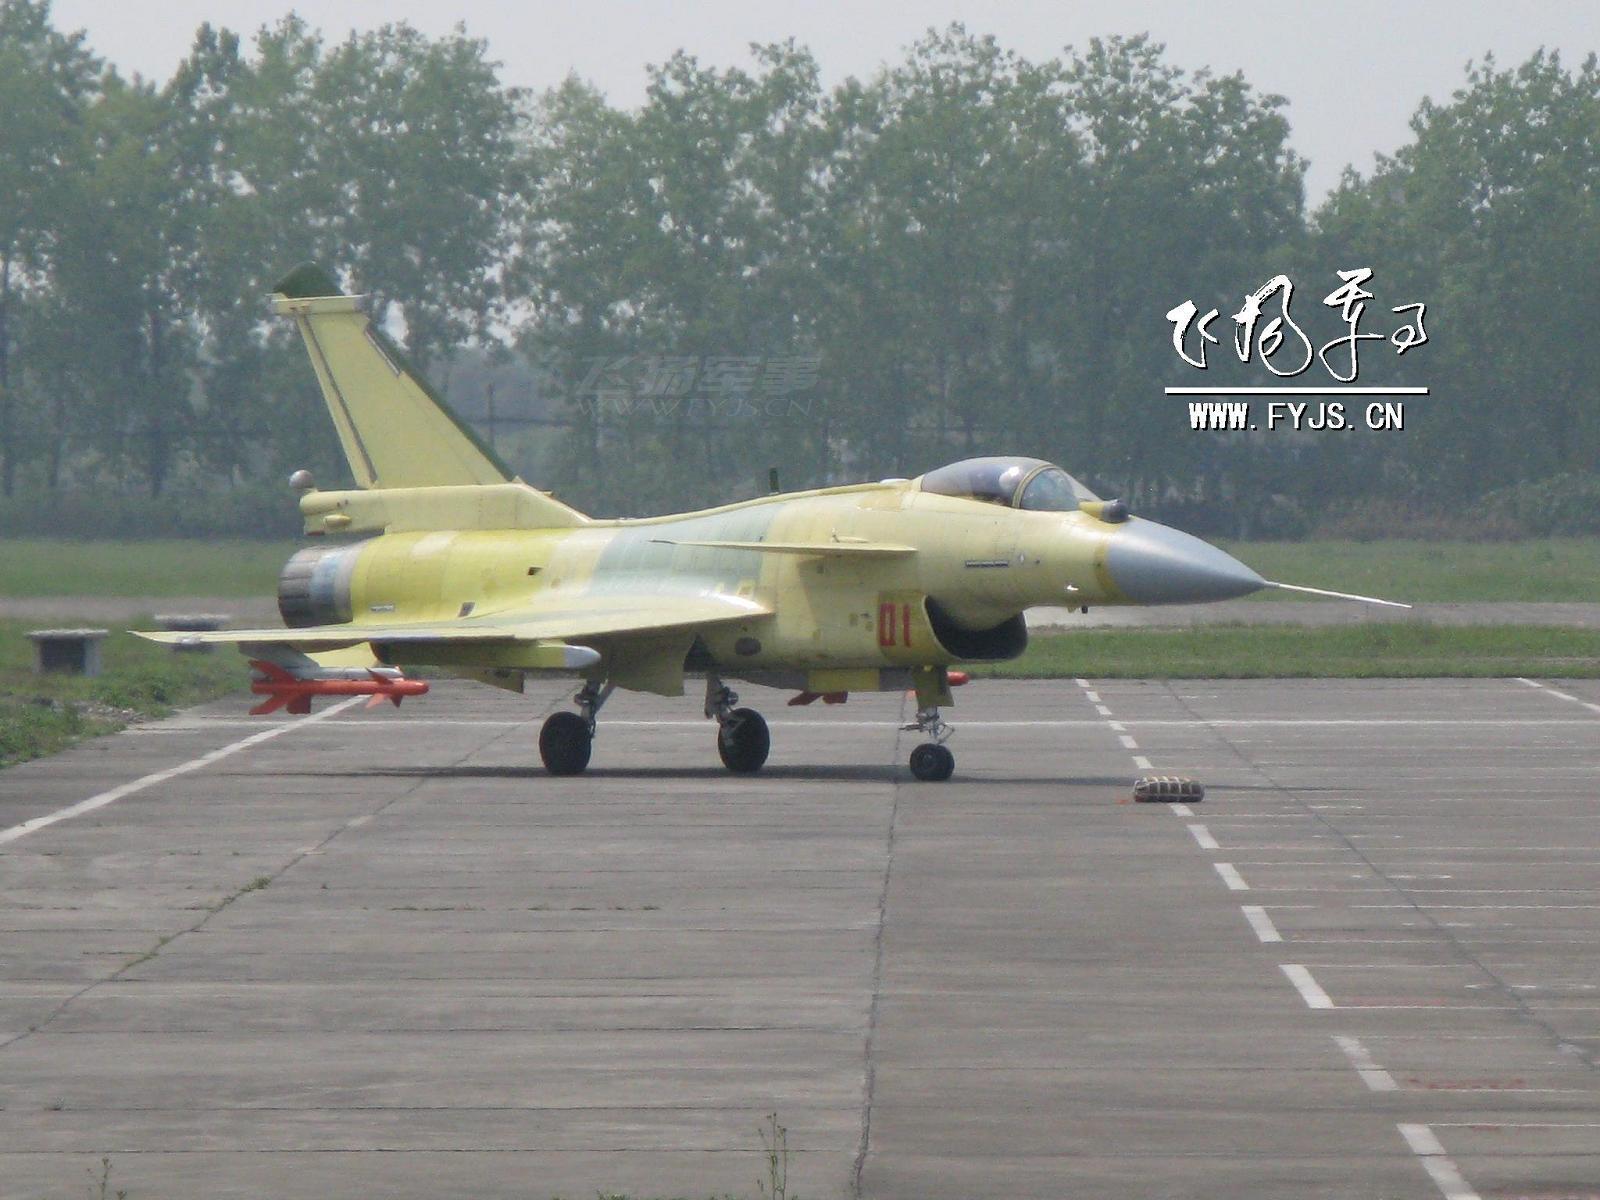 http://2.bp.blogspot.com/-tf-aF7NF8fQ/TZHcCb5HMnI/AAAAAAAAB0Y/uP9hv6kgkRY/s1600/Chengdu+J-10by+asian+defence+%252819%2529.jpg